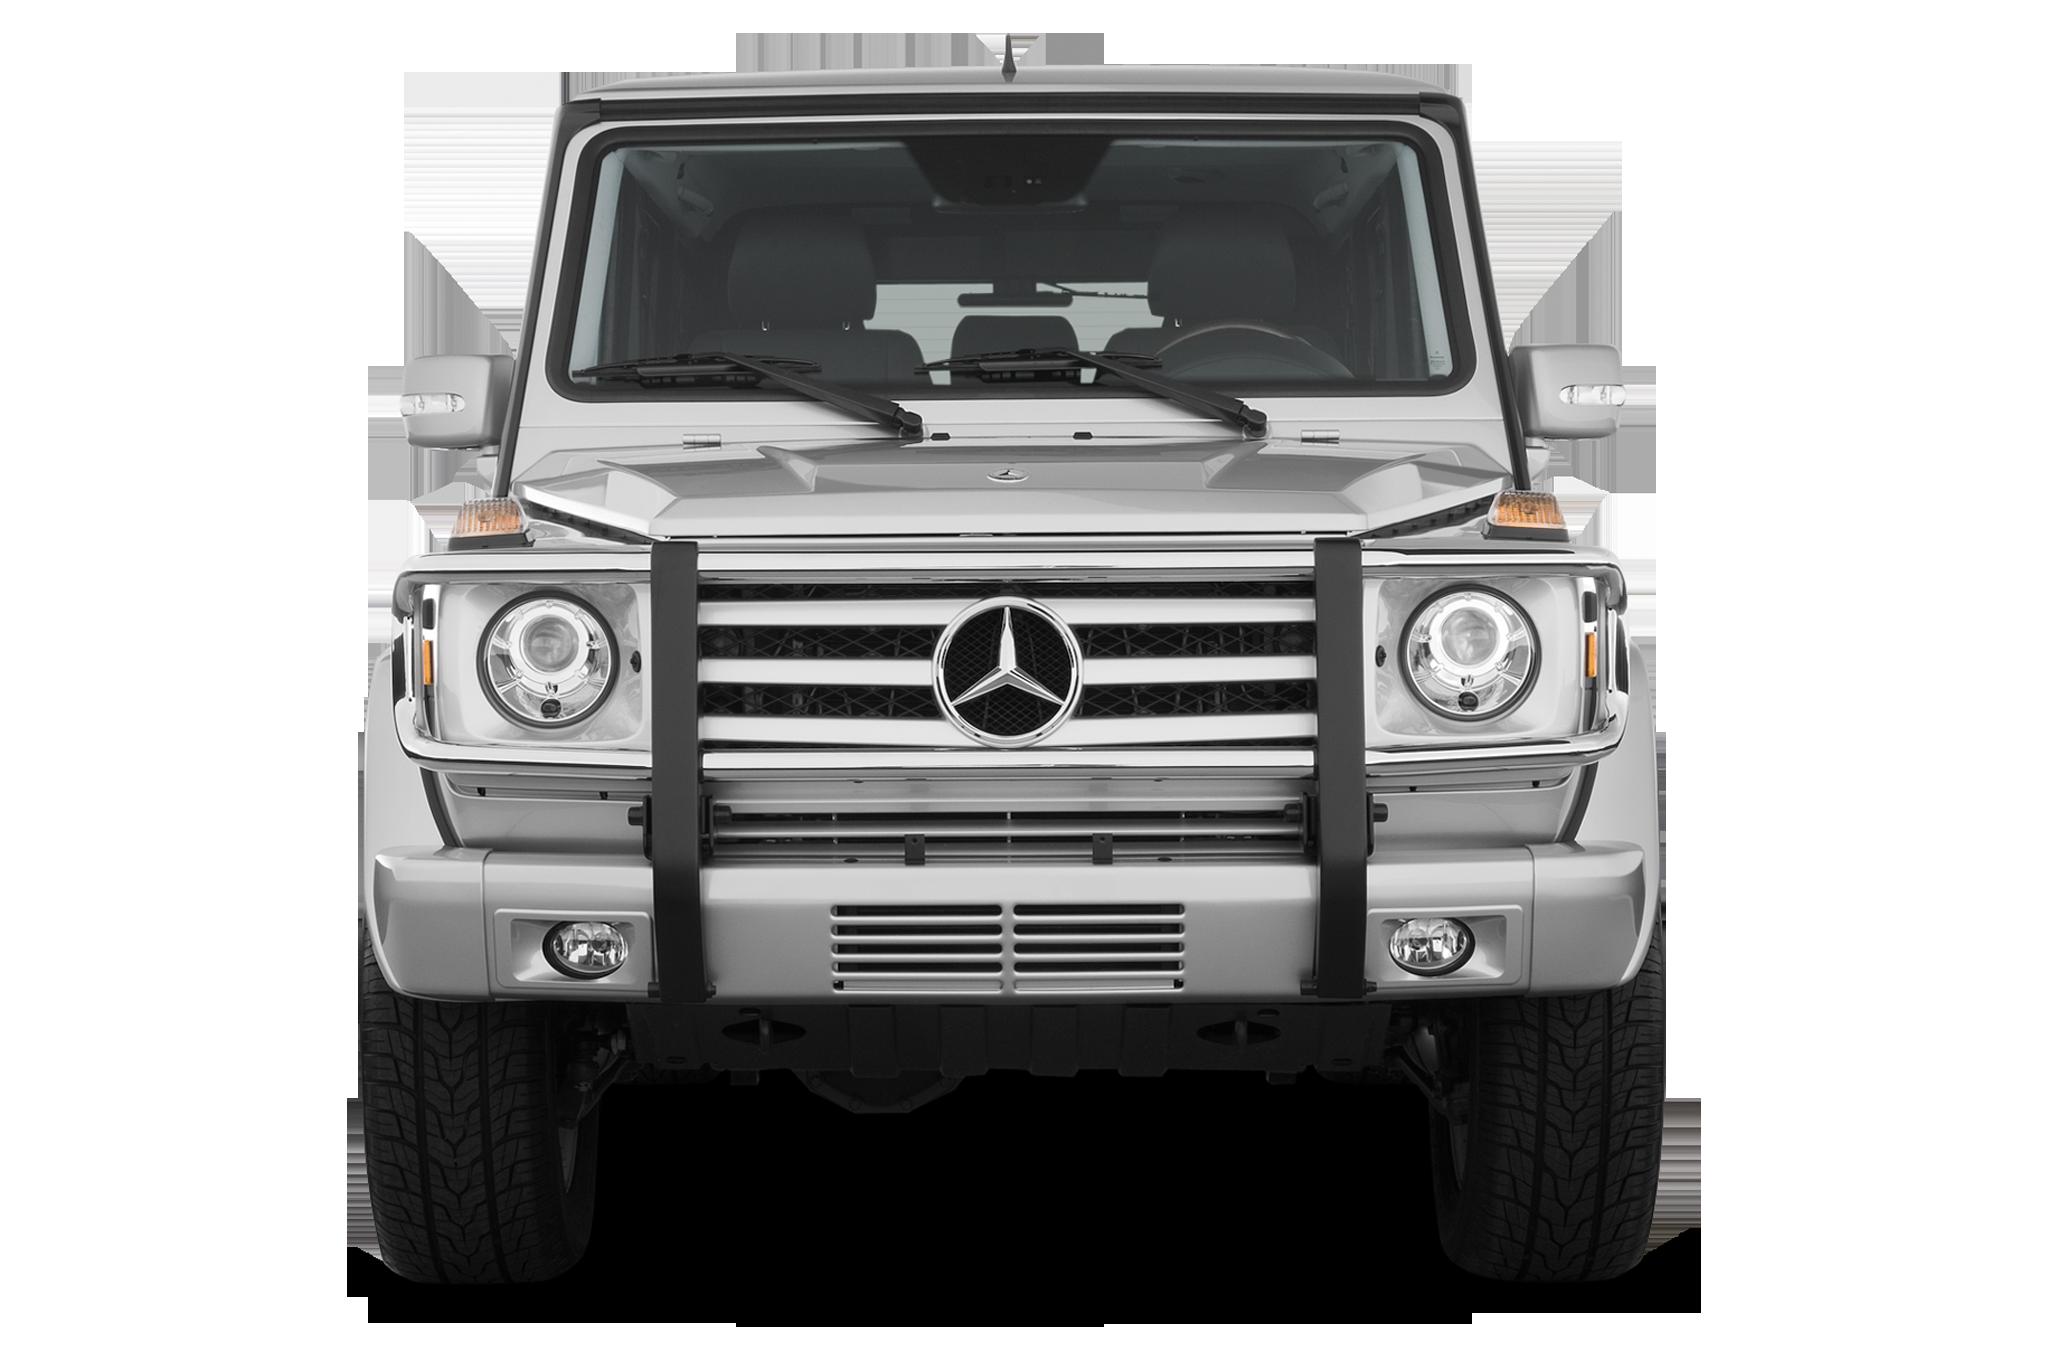 Mercedes Benz Planning Bmw Like Gls Suv